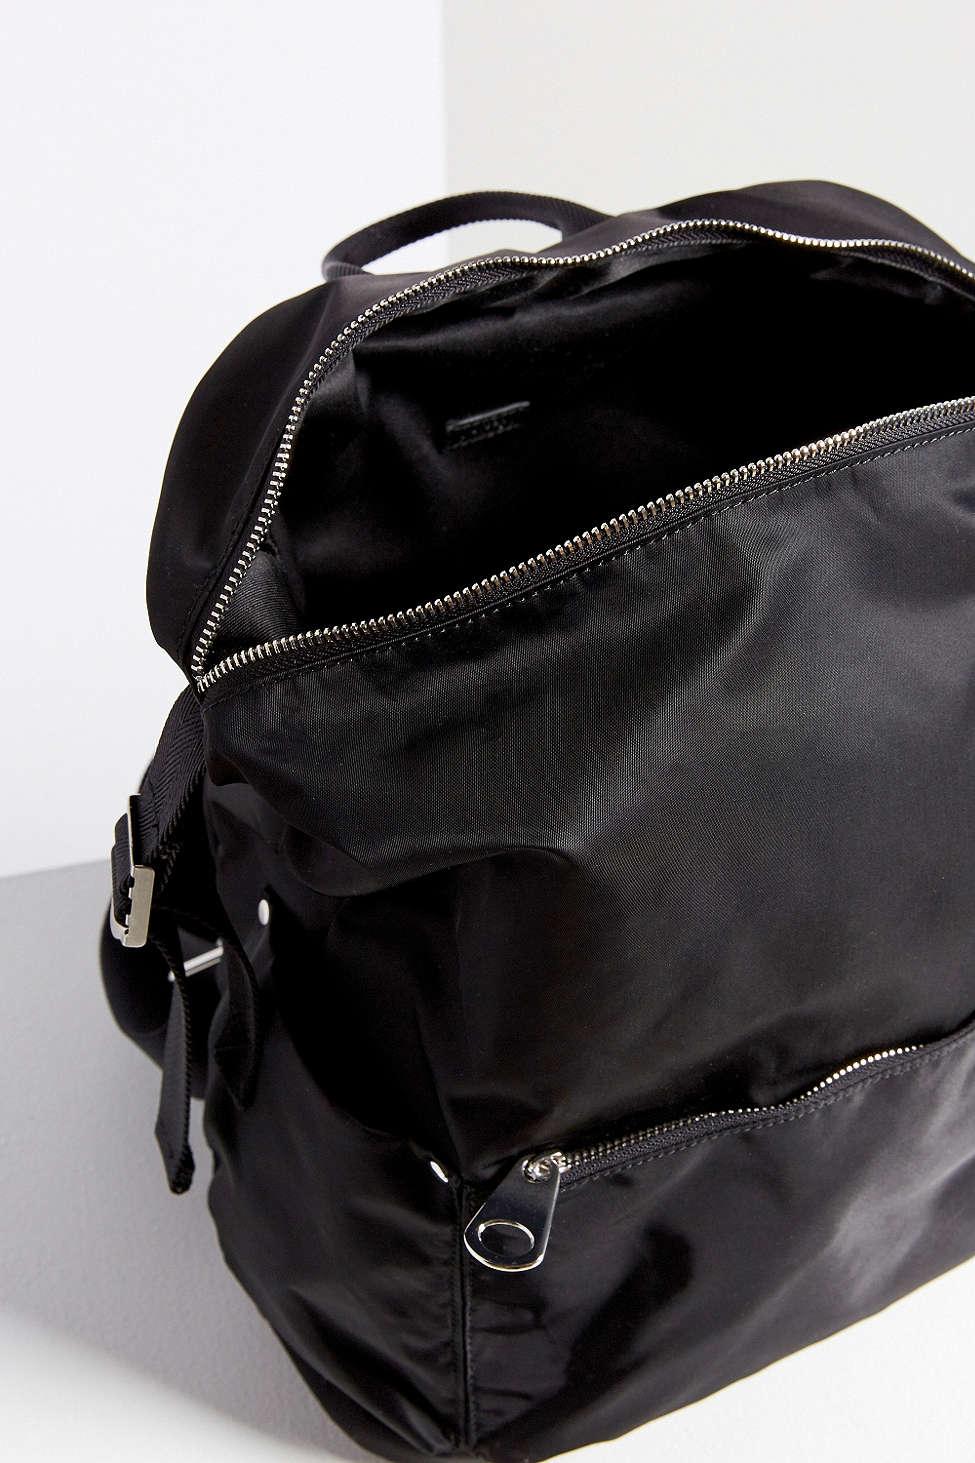 71d145f02db Silence + Noise Nylon Backpack in Black - Lyst